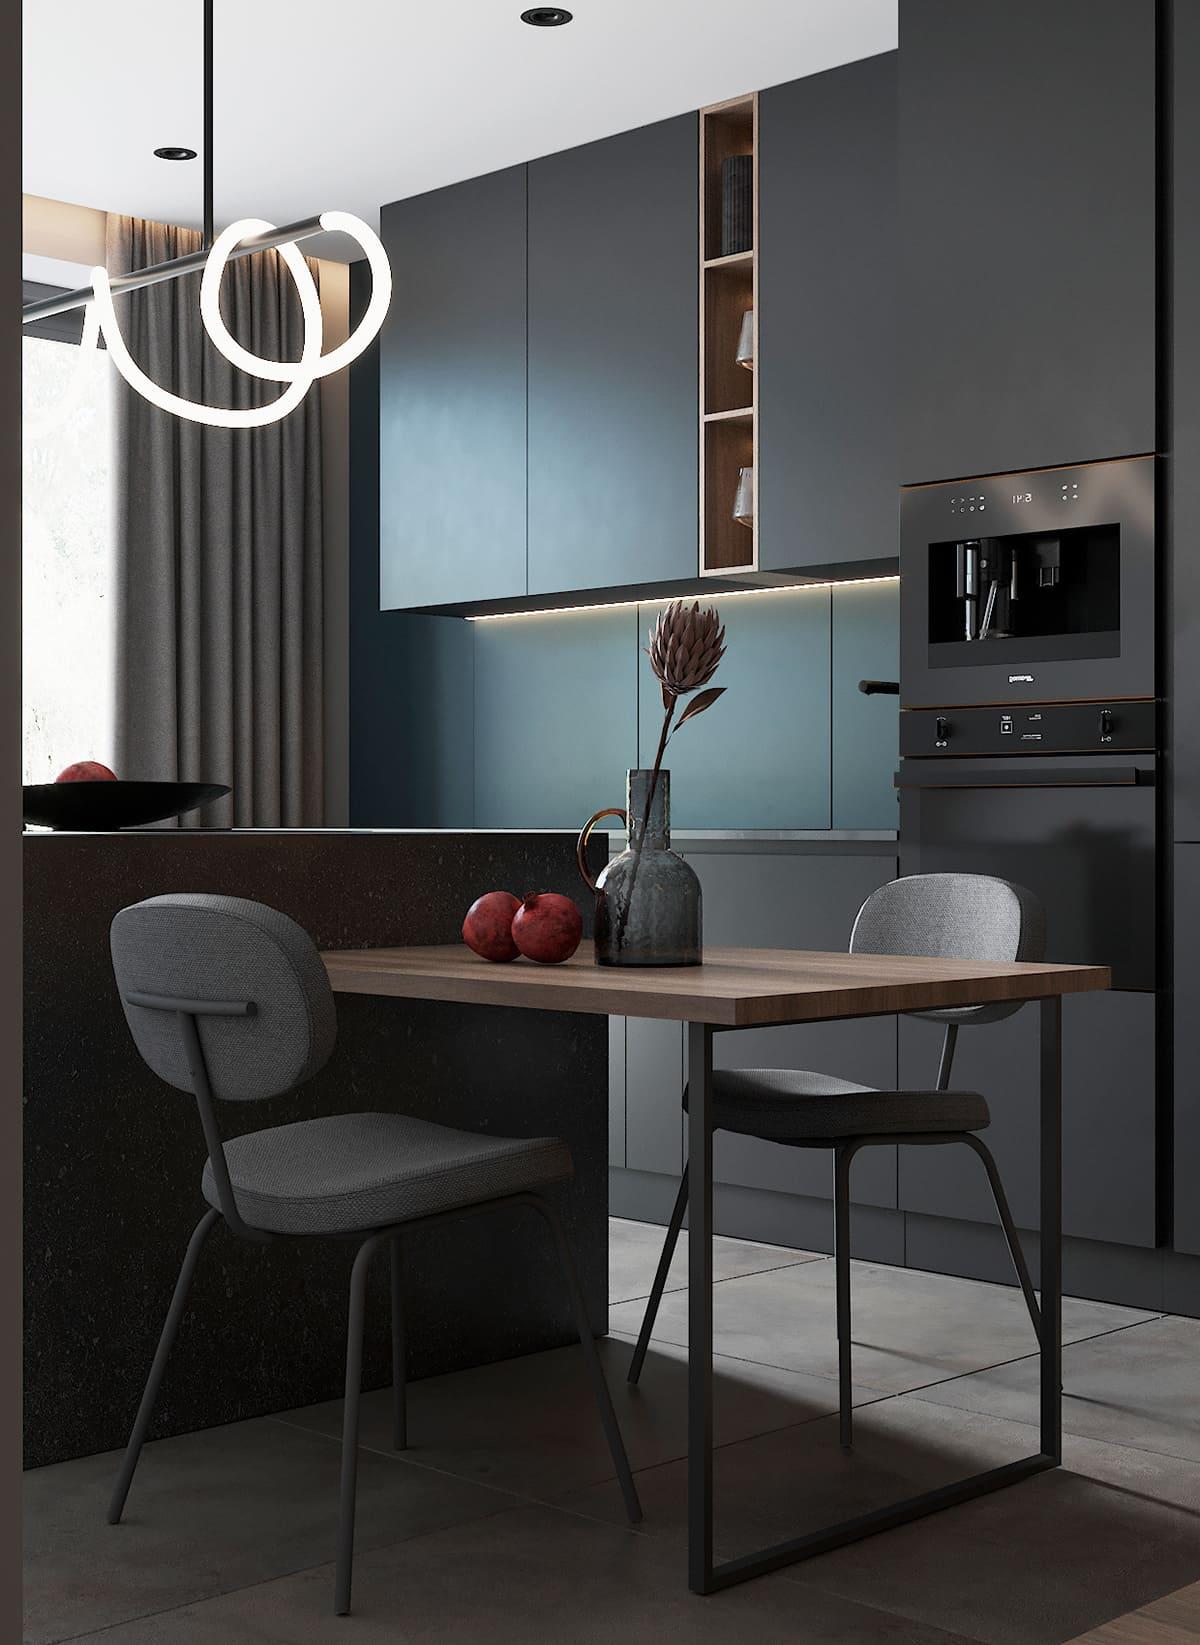 модный дизайн интерьера квартиры фото 54